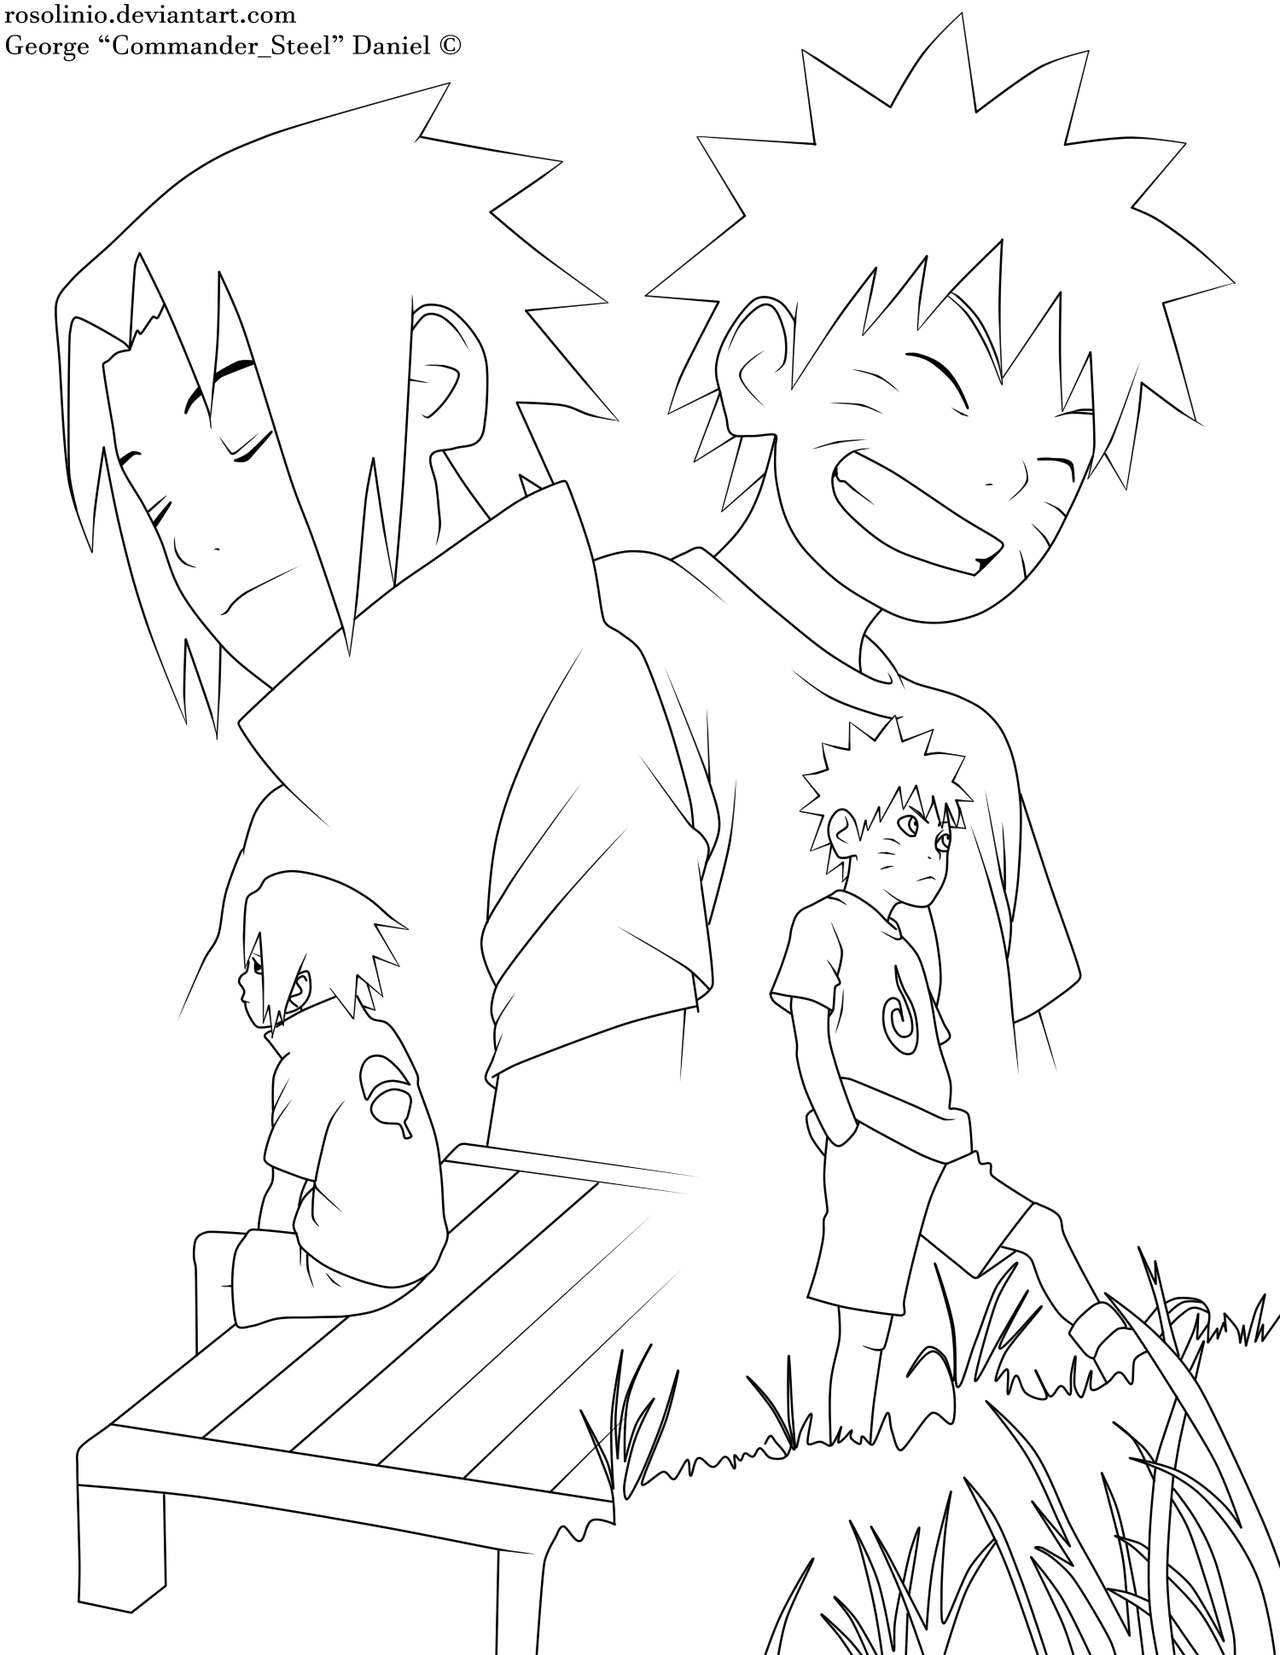 Lineart Naruto : Naruto and sasuke lineart by rosolinio on deviantart